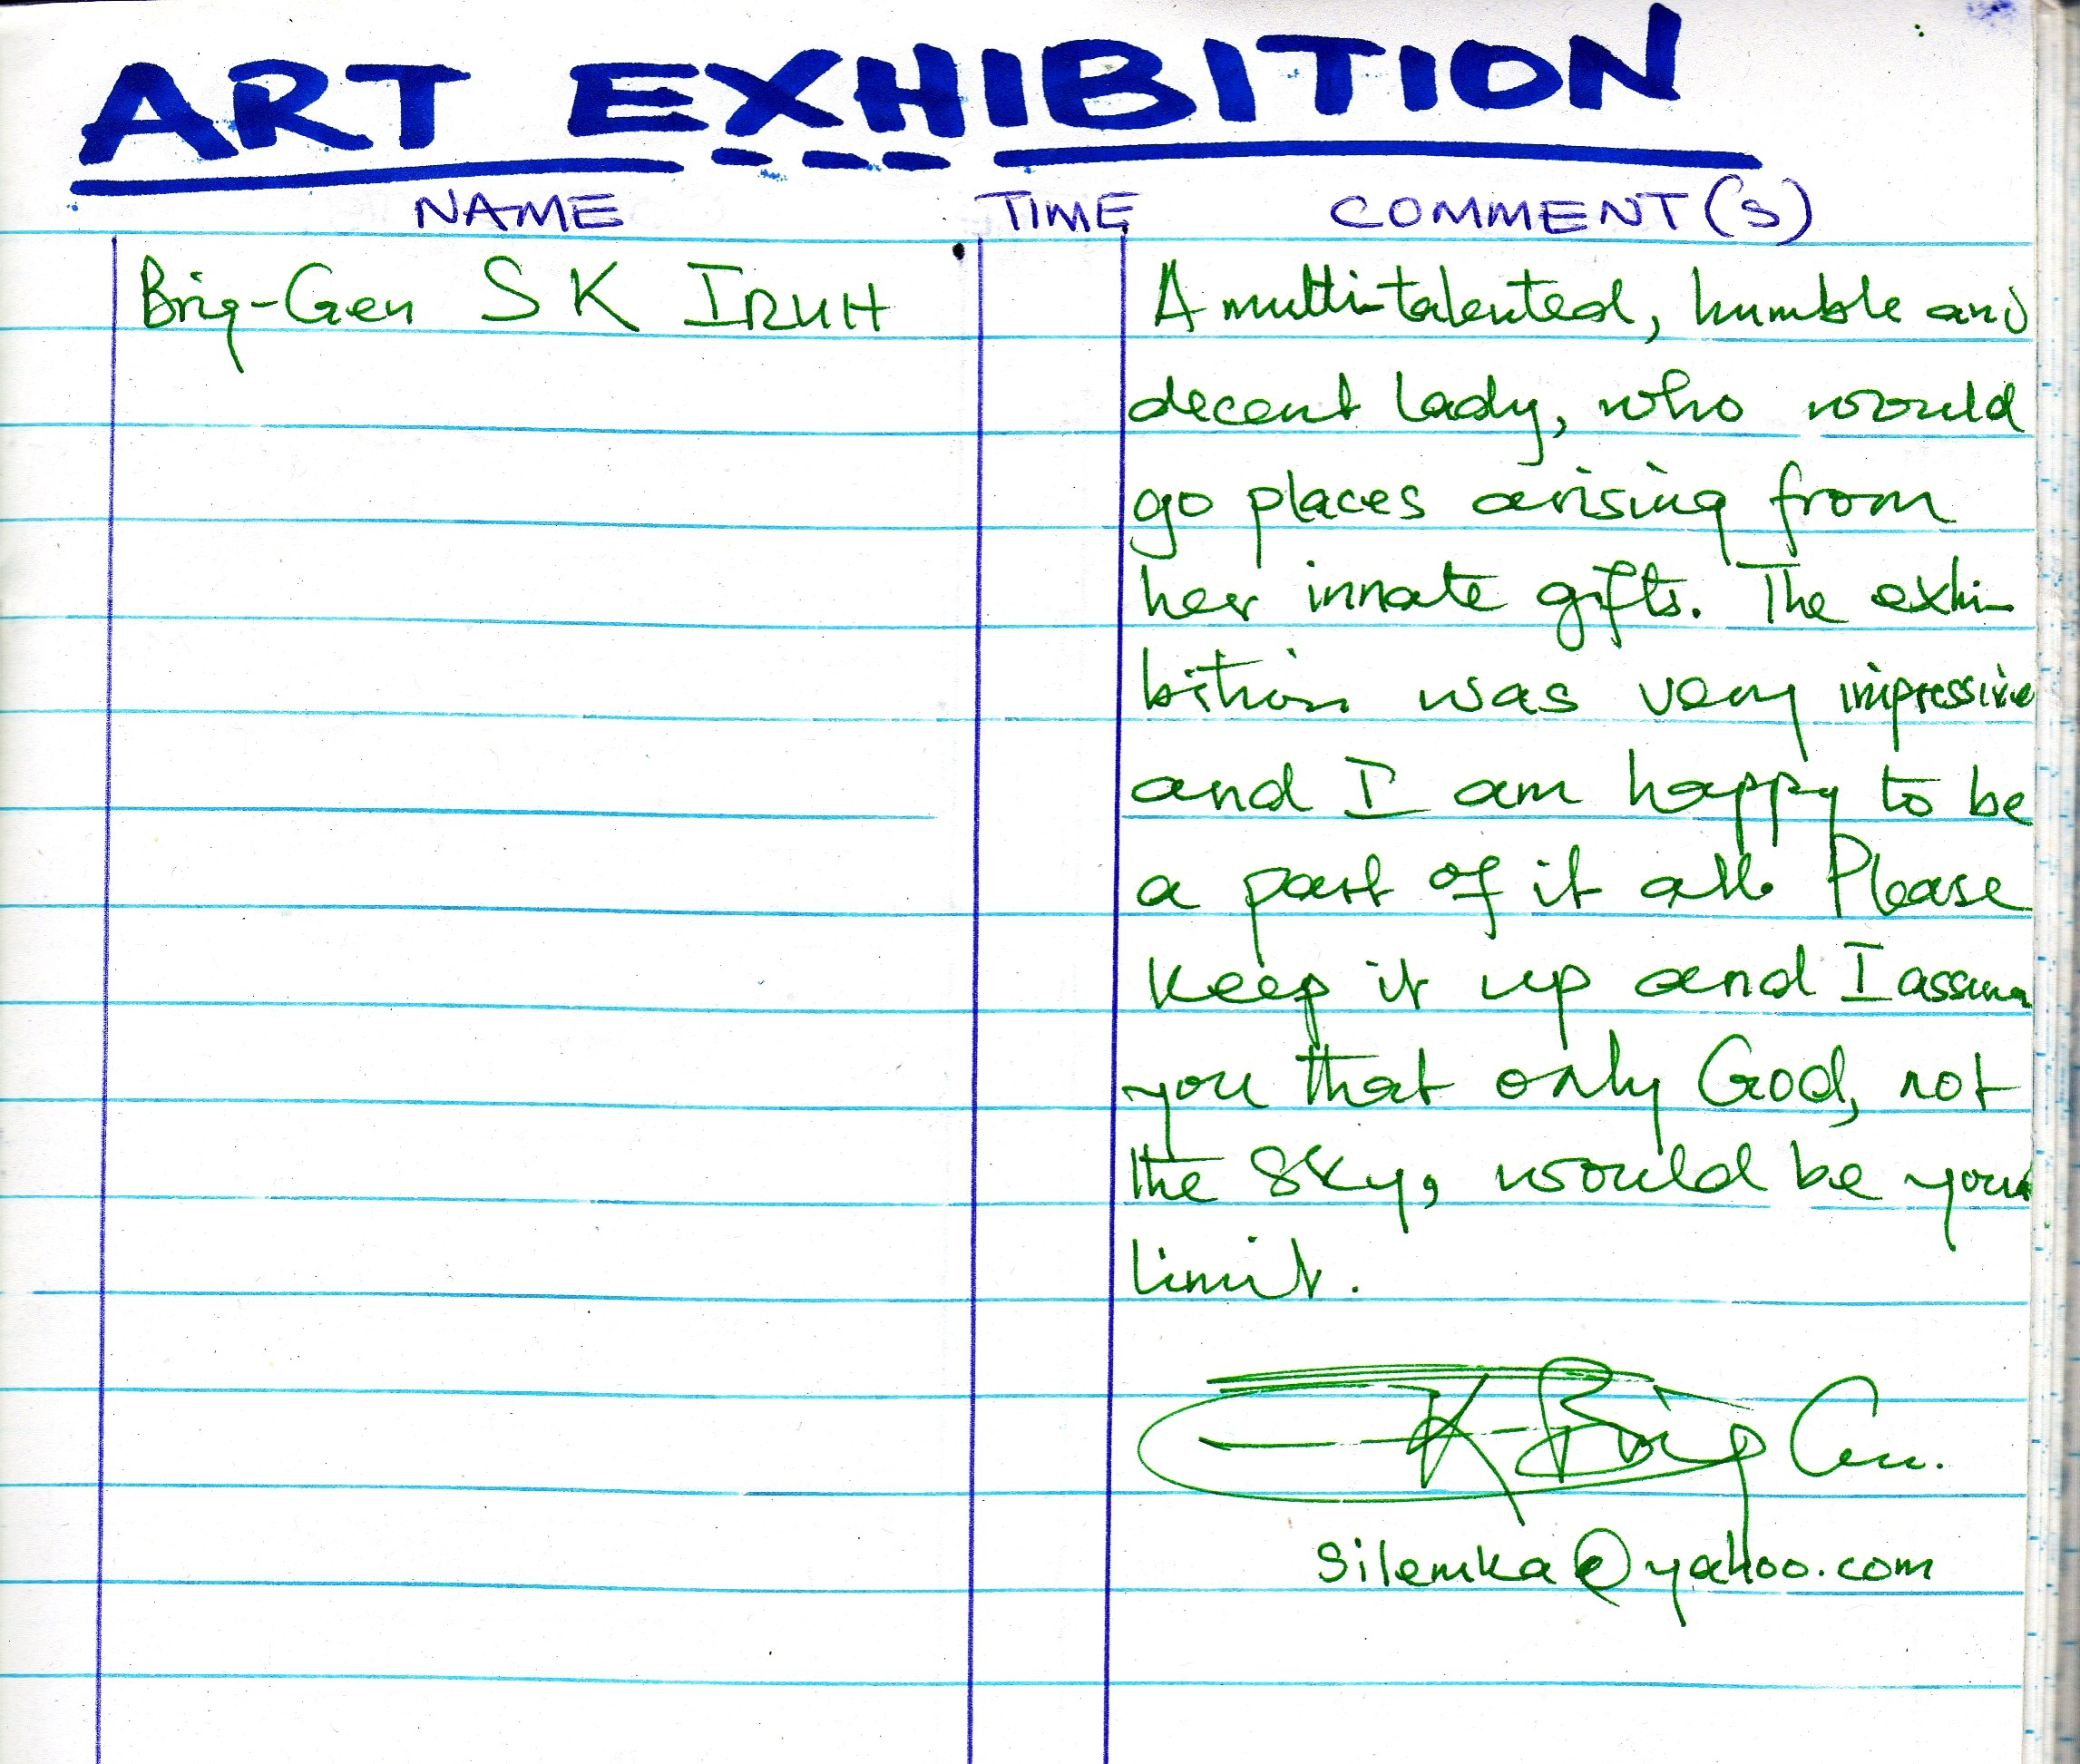 Testimonial By Brig Gen S K Iruh